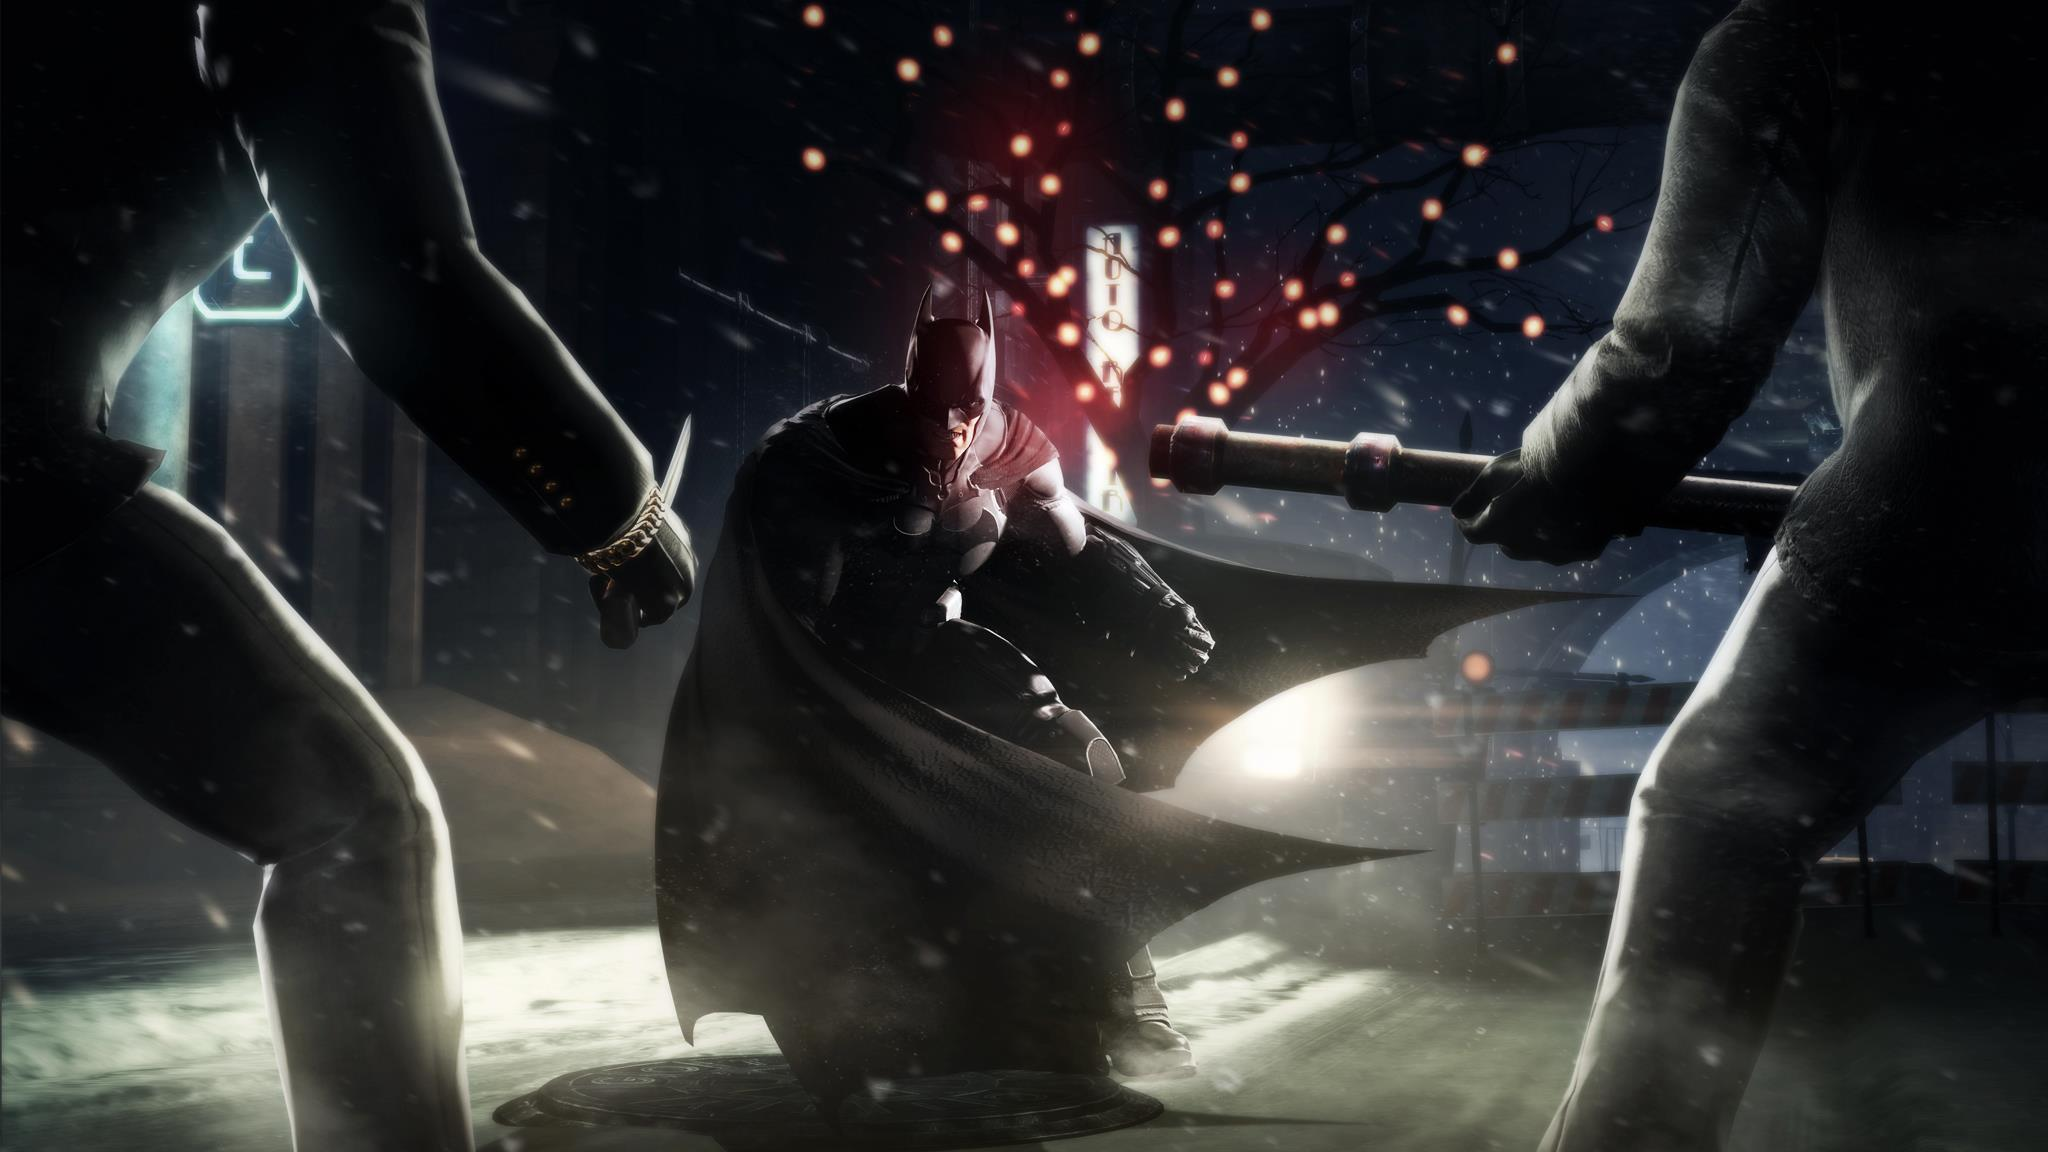 Tuna nových informací o Batman: Arkham Origins 80528